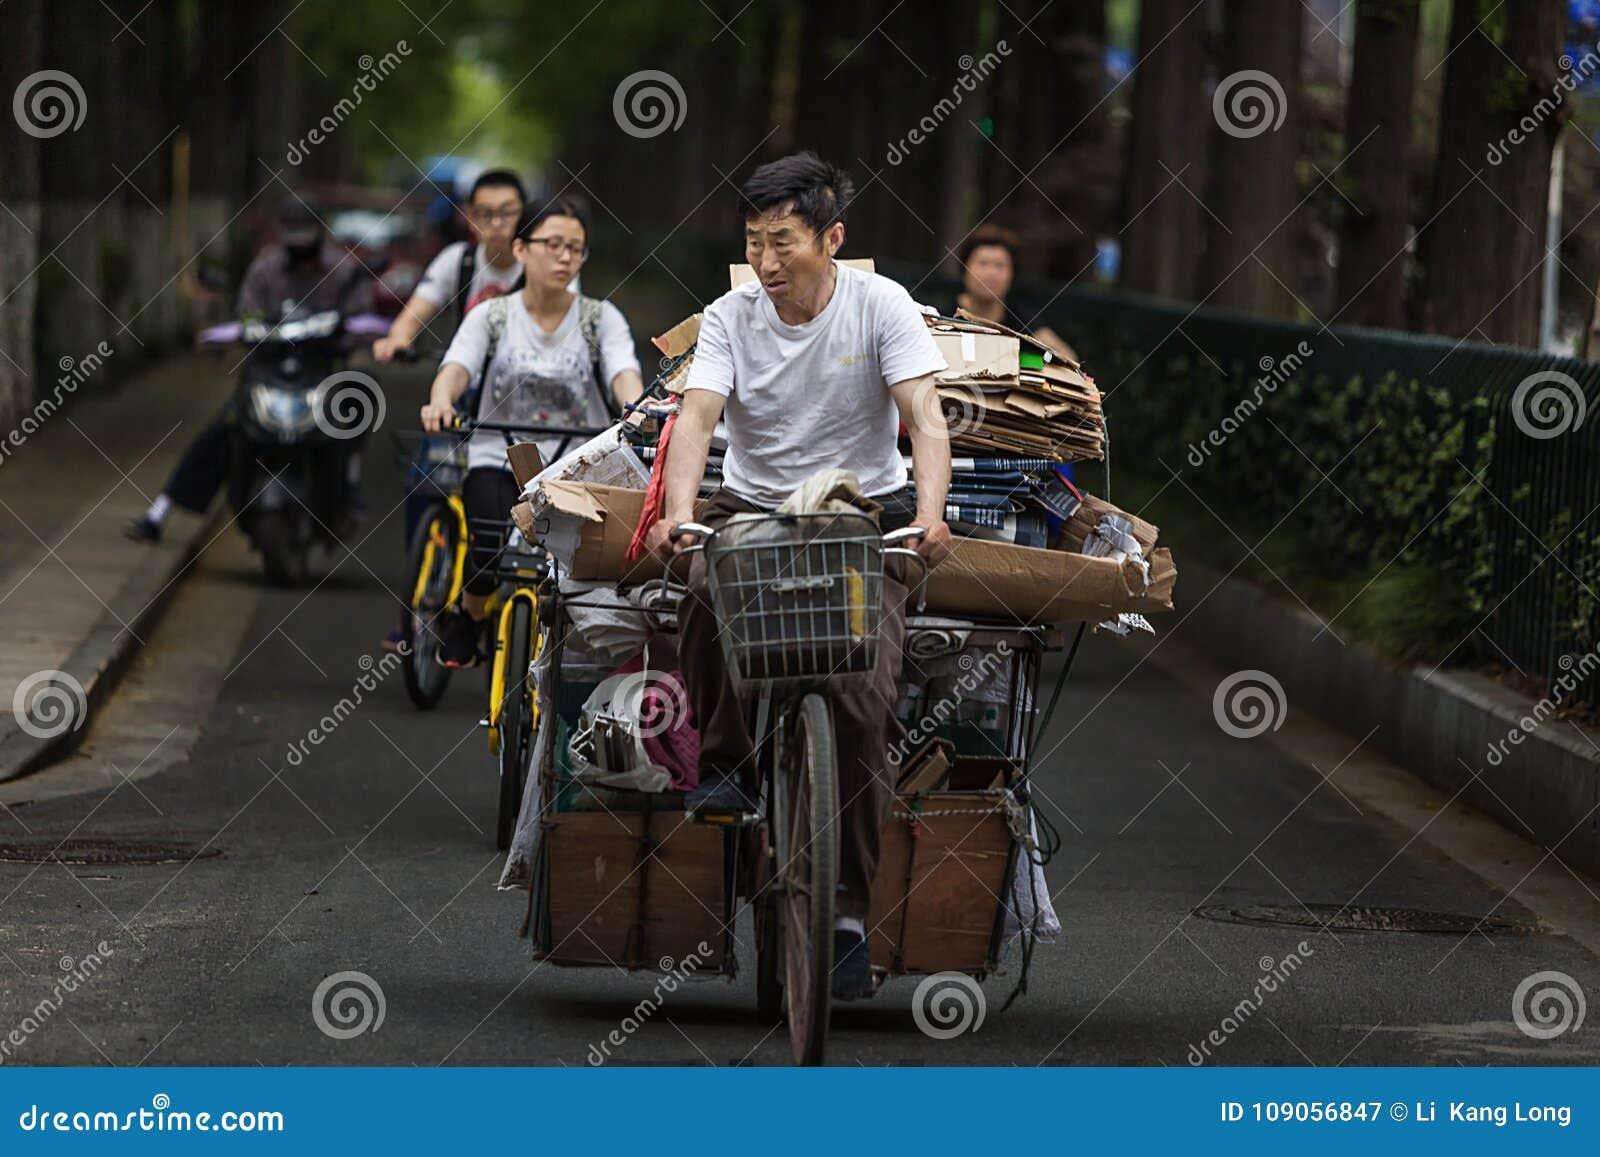 Man riding a bike to buy scrap